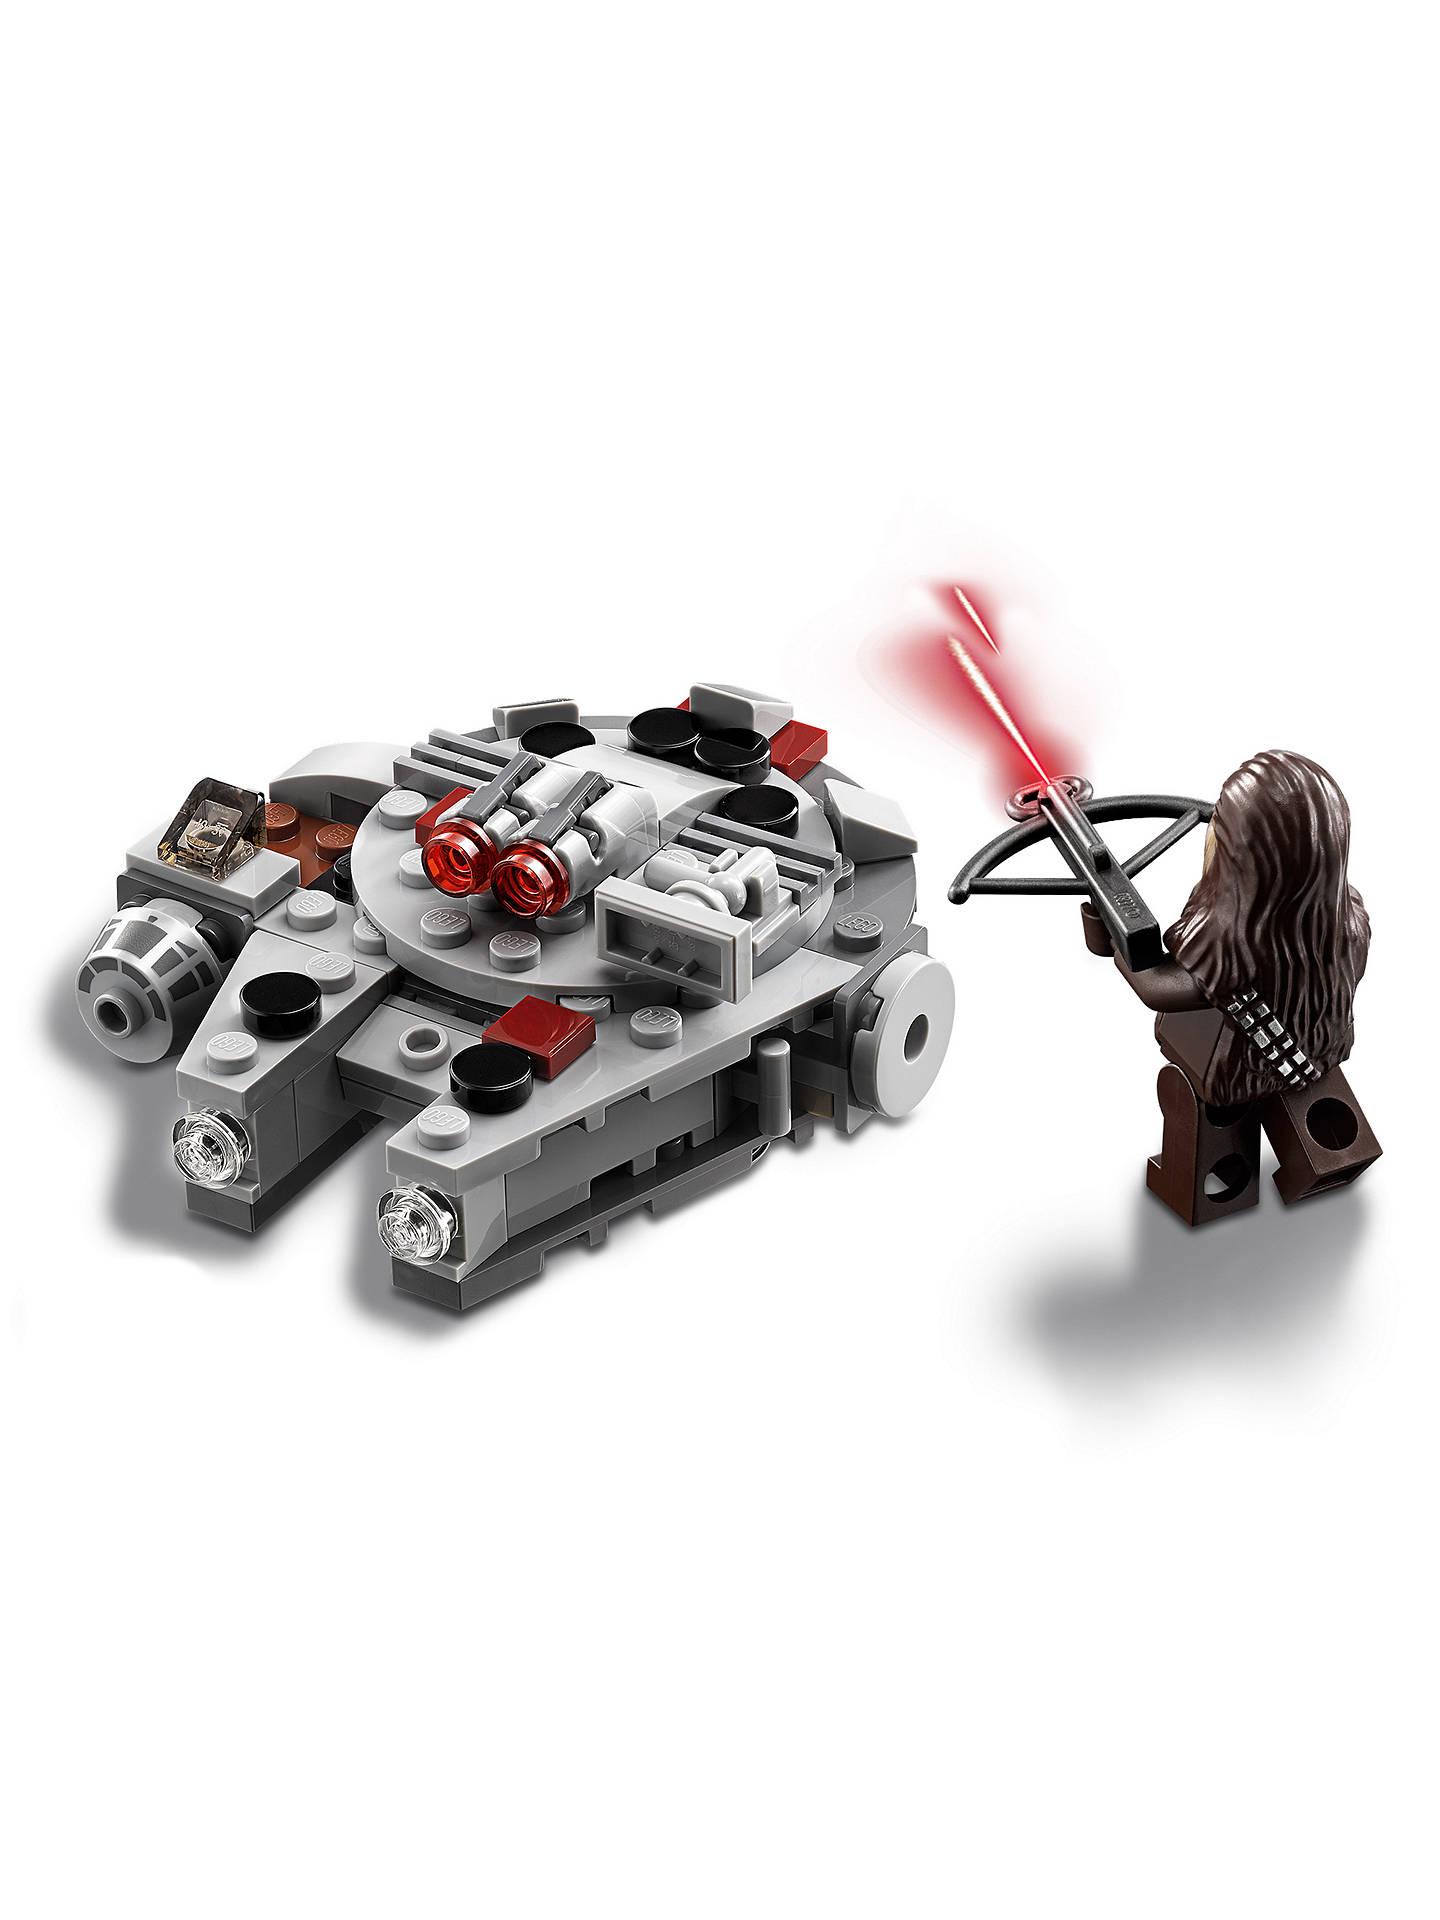 Lego Star Wars 75193 Millennium Falcon Microfighter At John Lewis